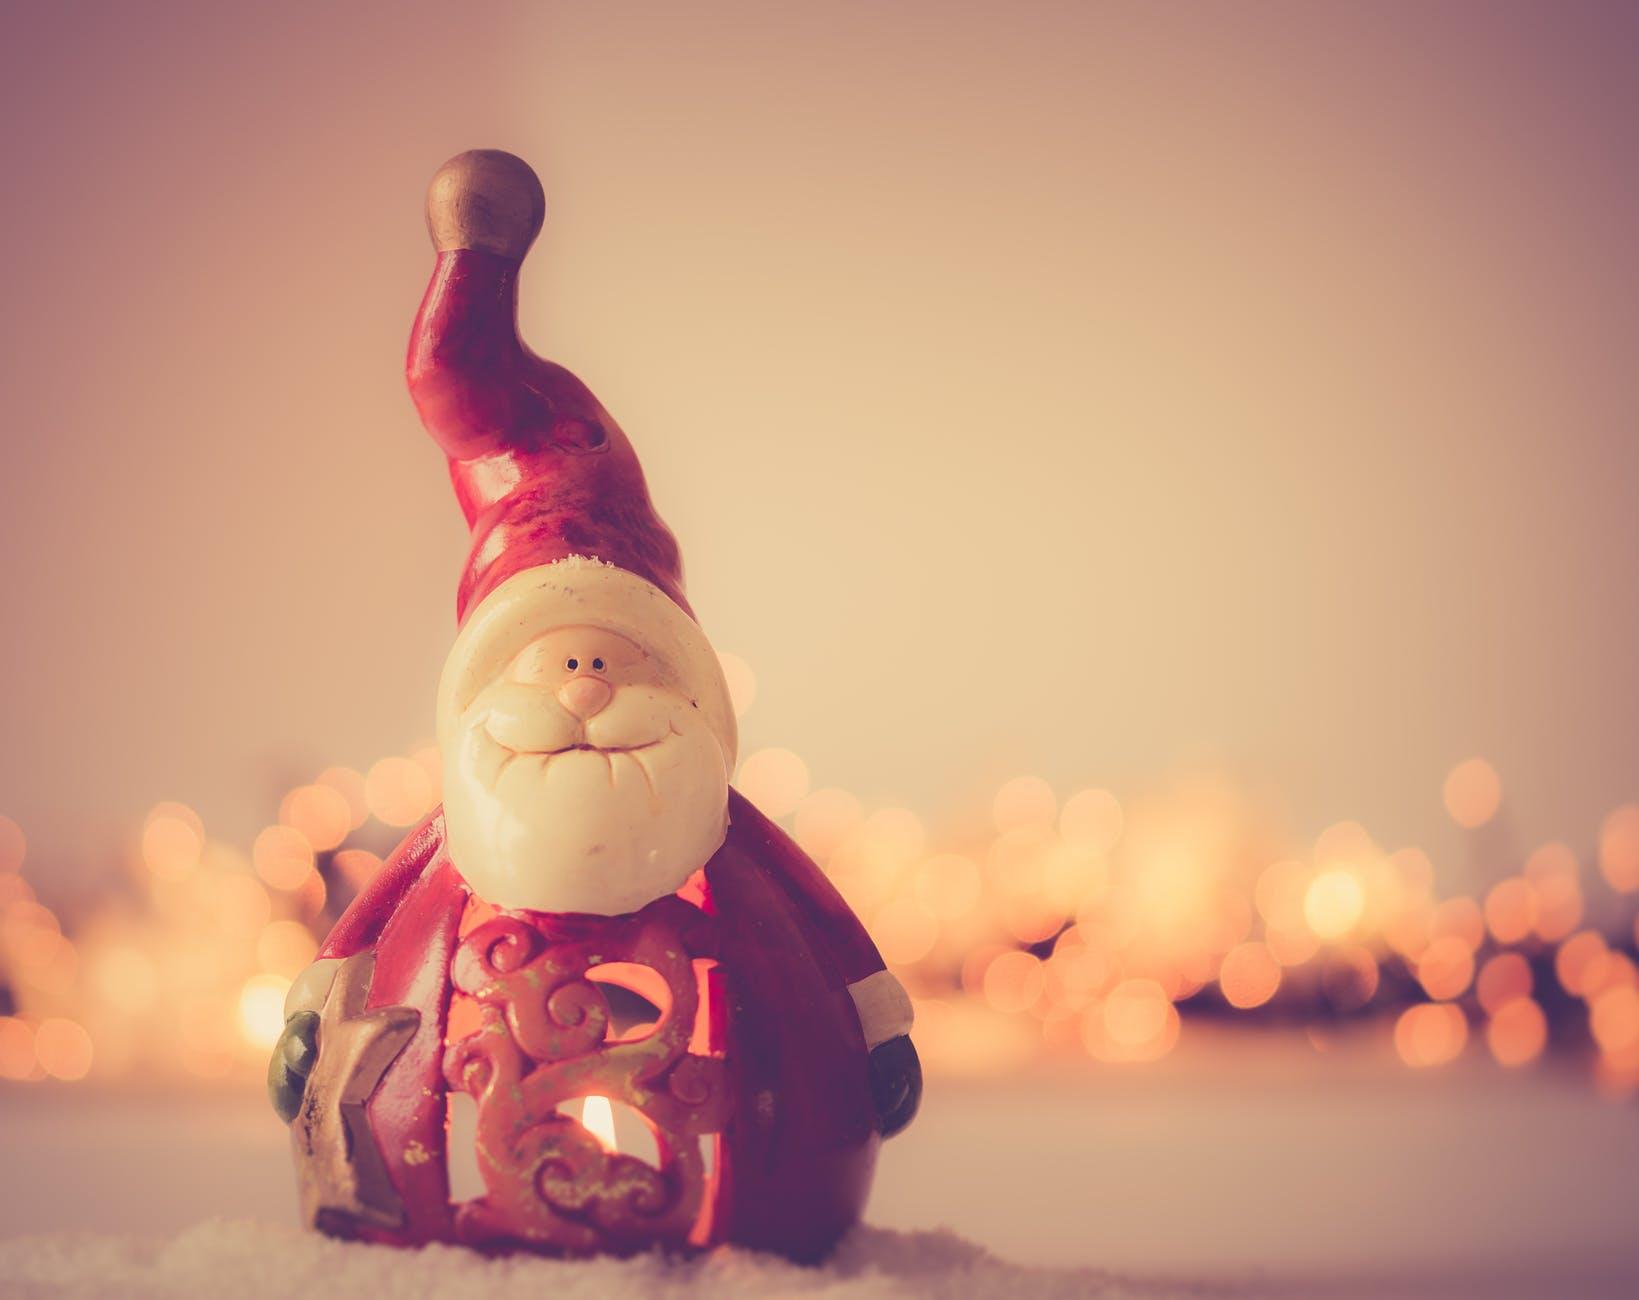 shallow focus photography of santa claus figurine